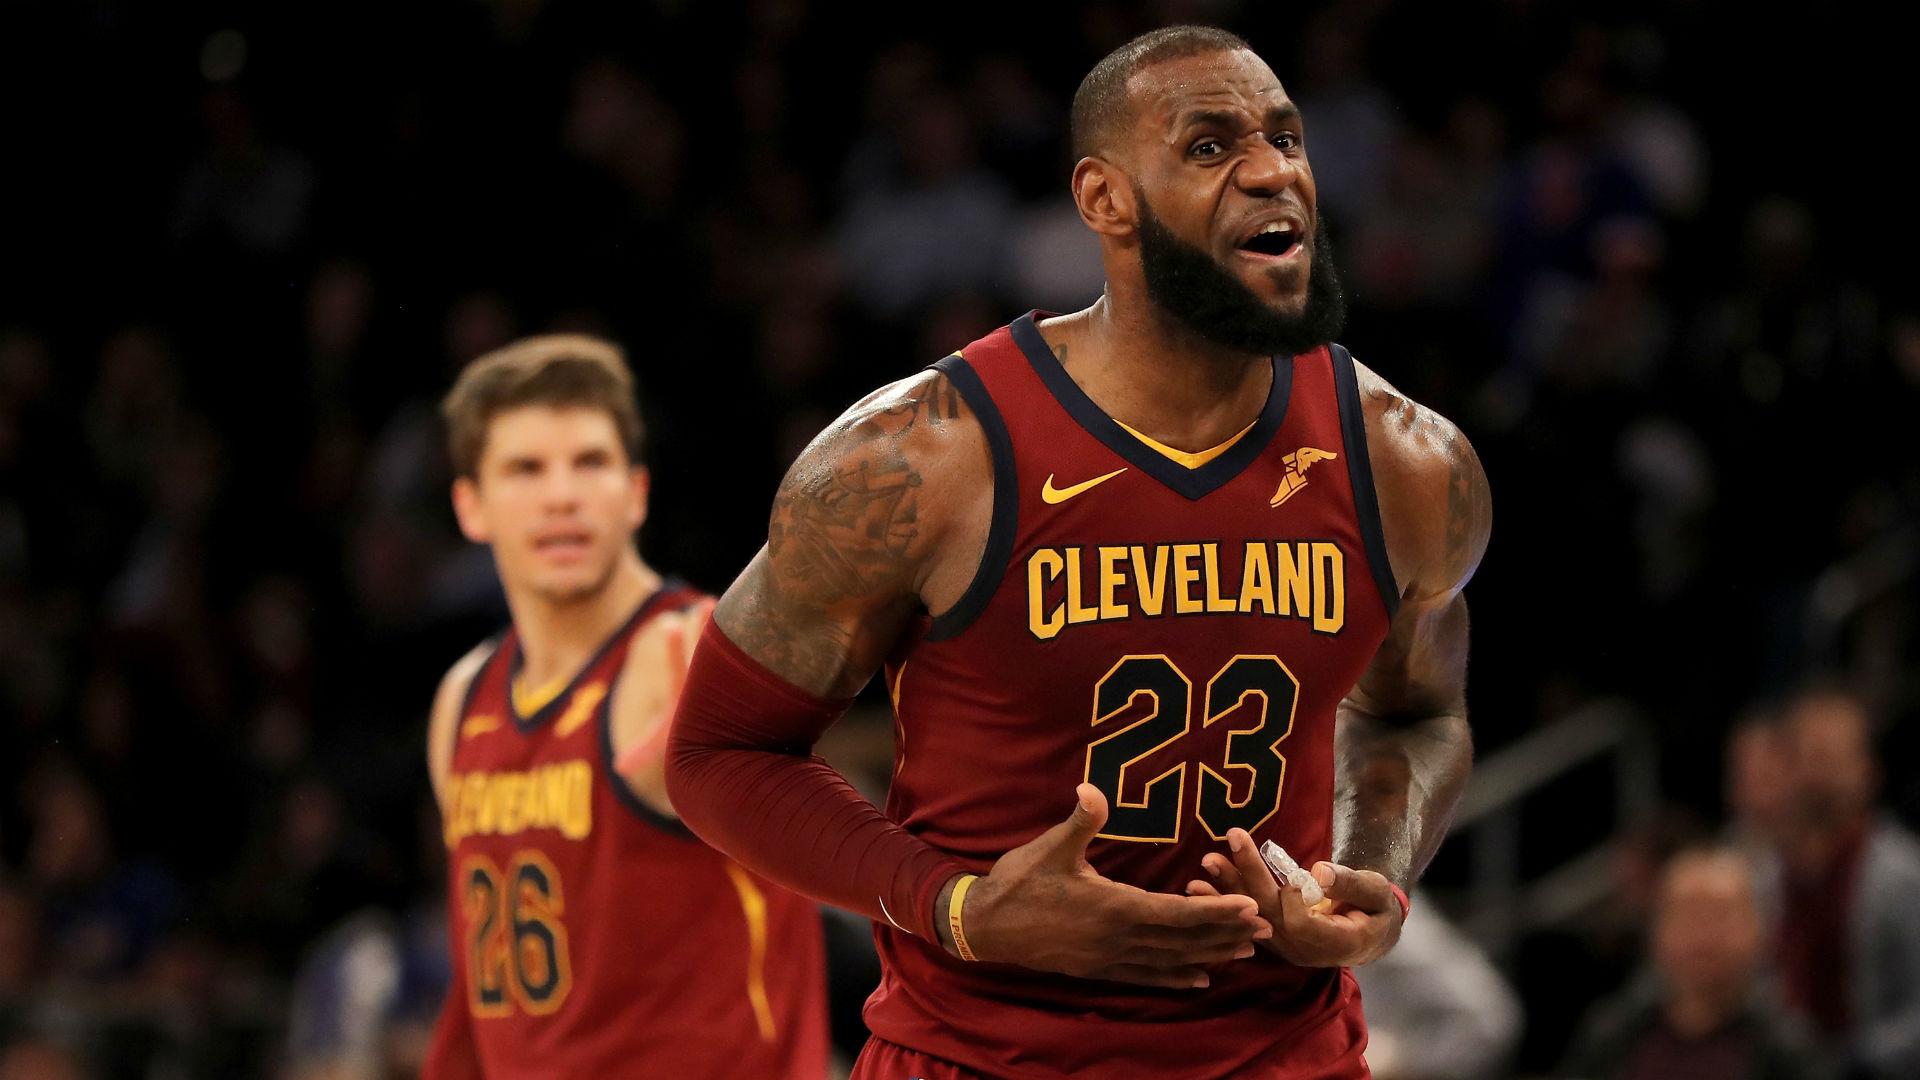 Watch: LeBron James bricks highlight-reel dunk